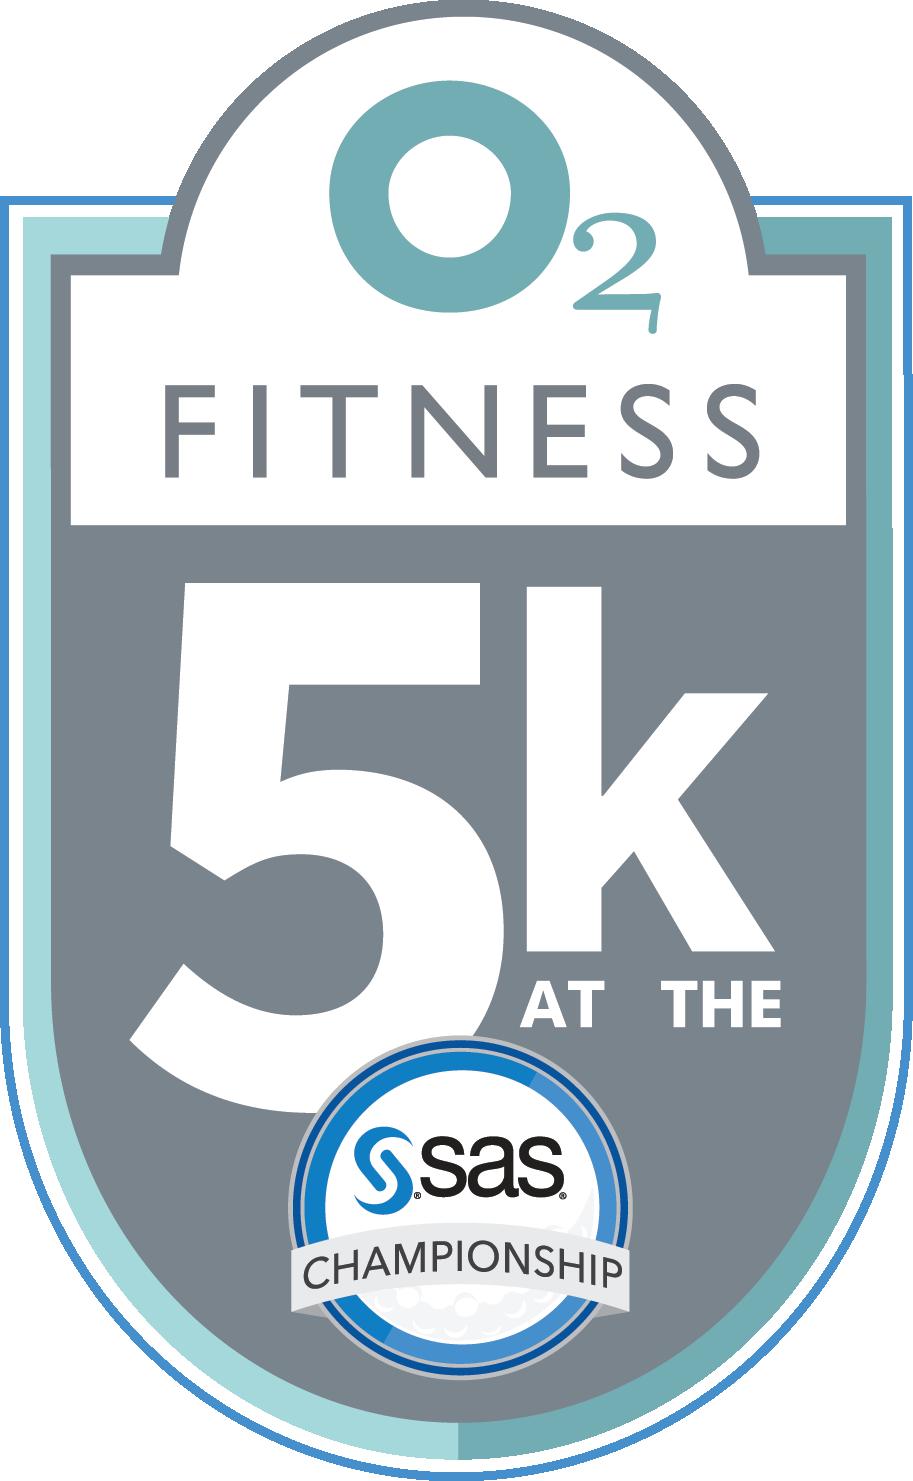 O2 Fitness 5K at the SAS Championship